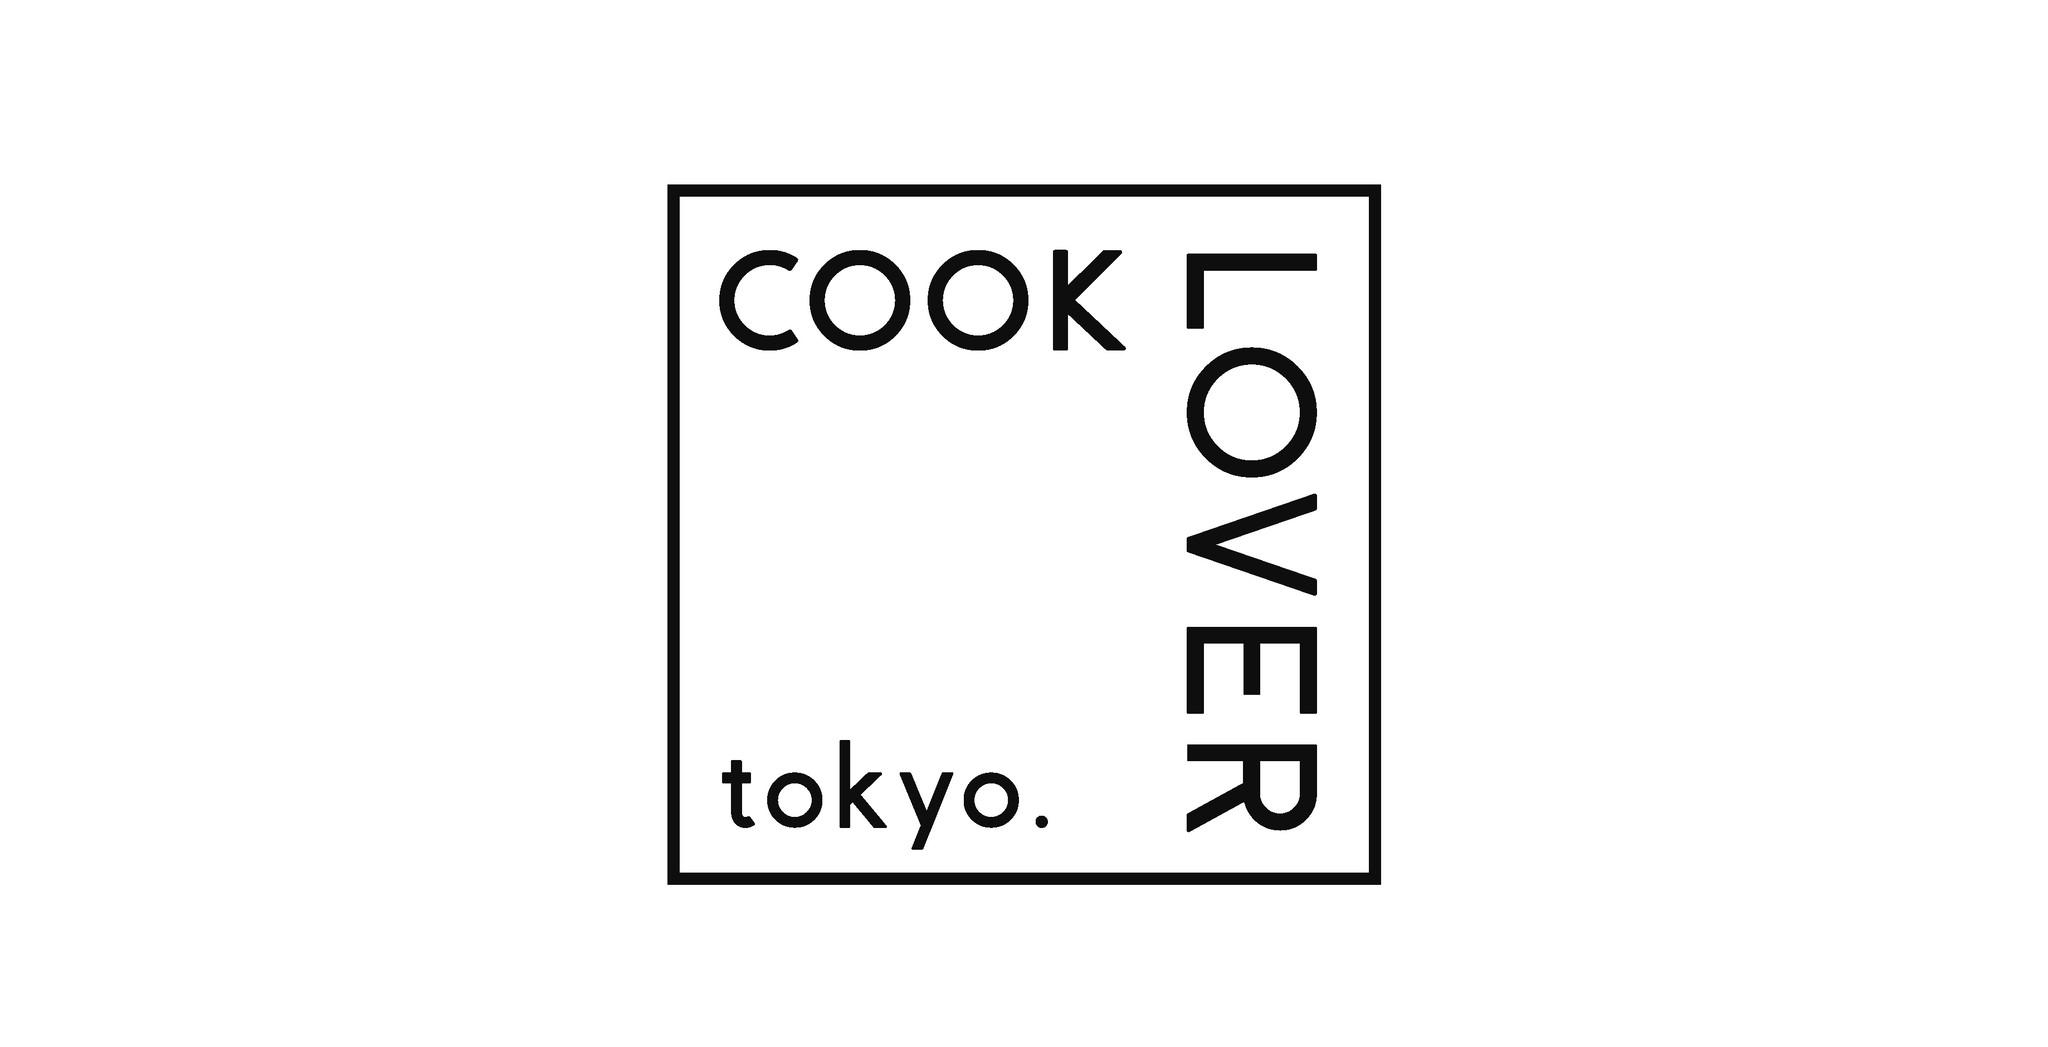 COOK LOVER tokyo.